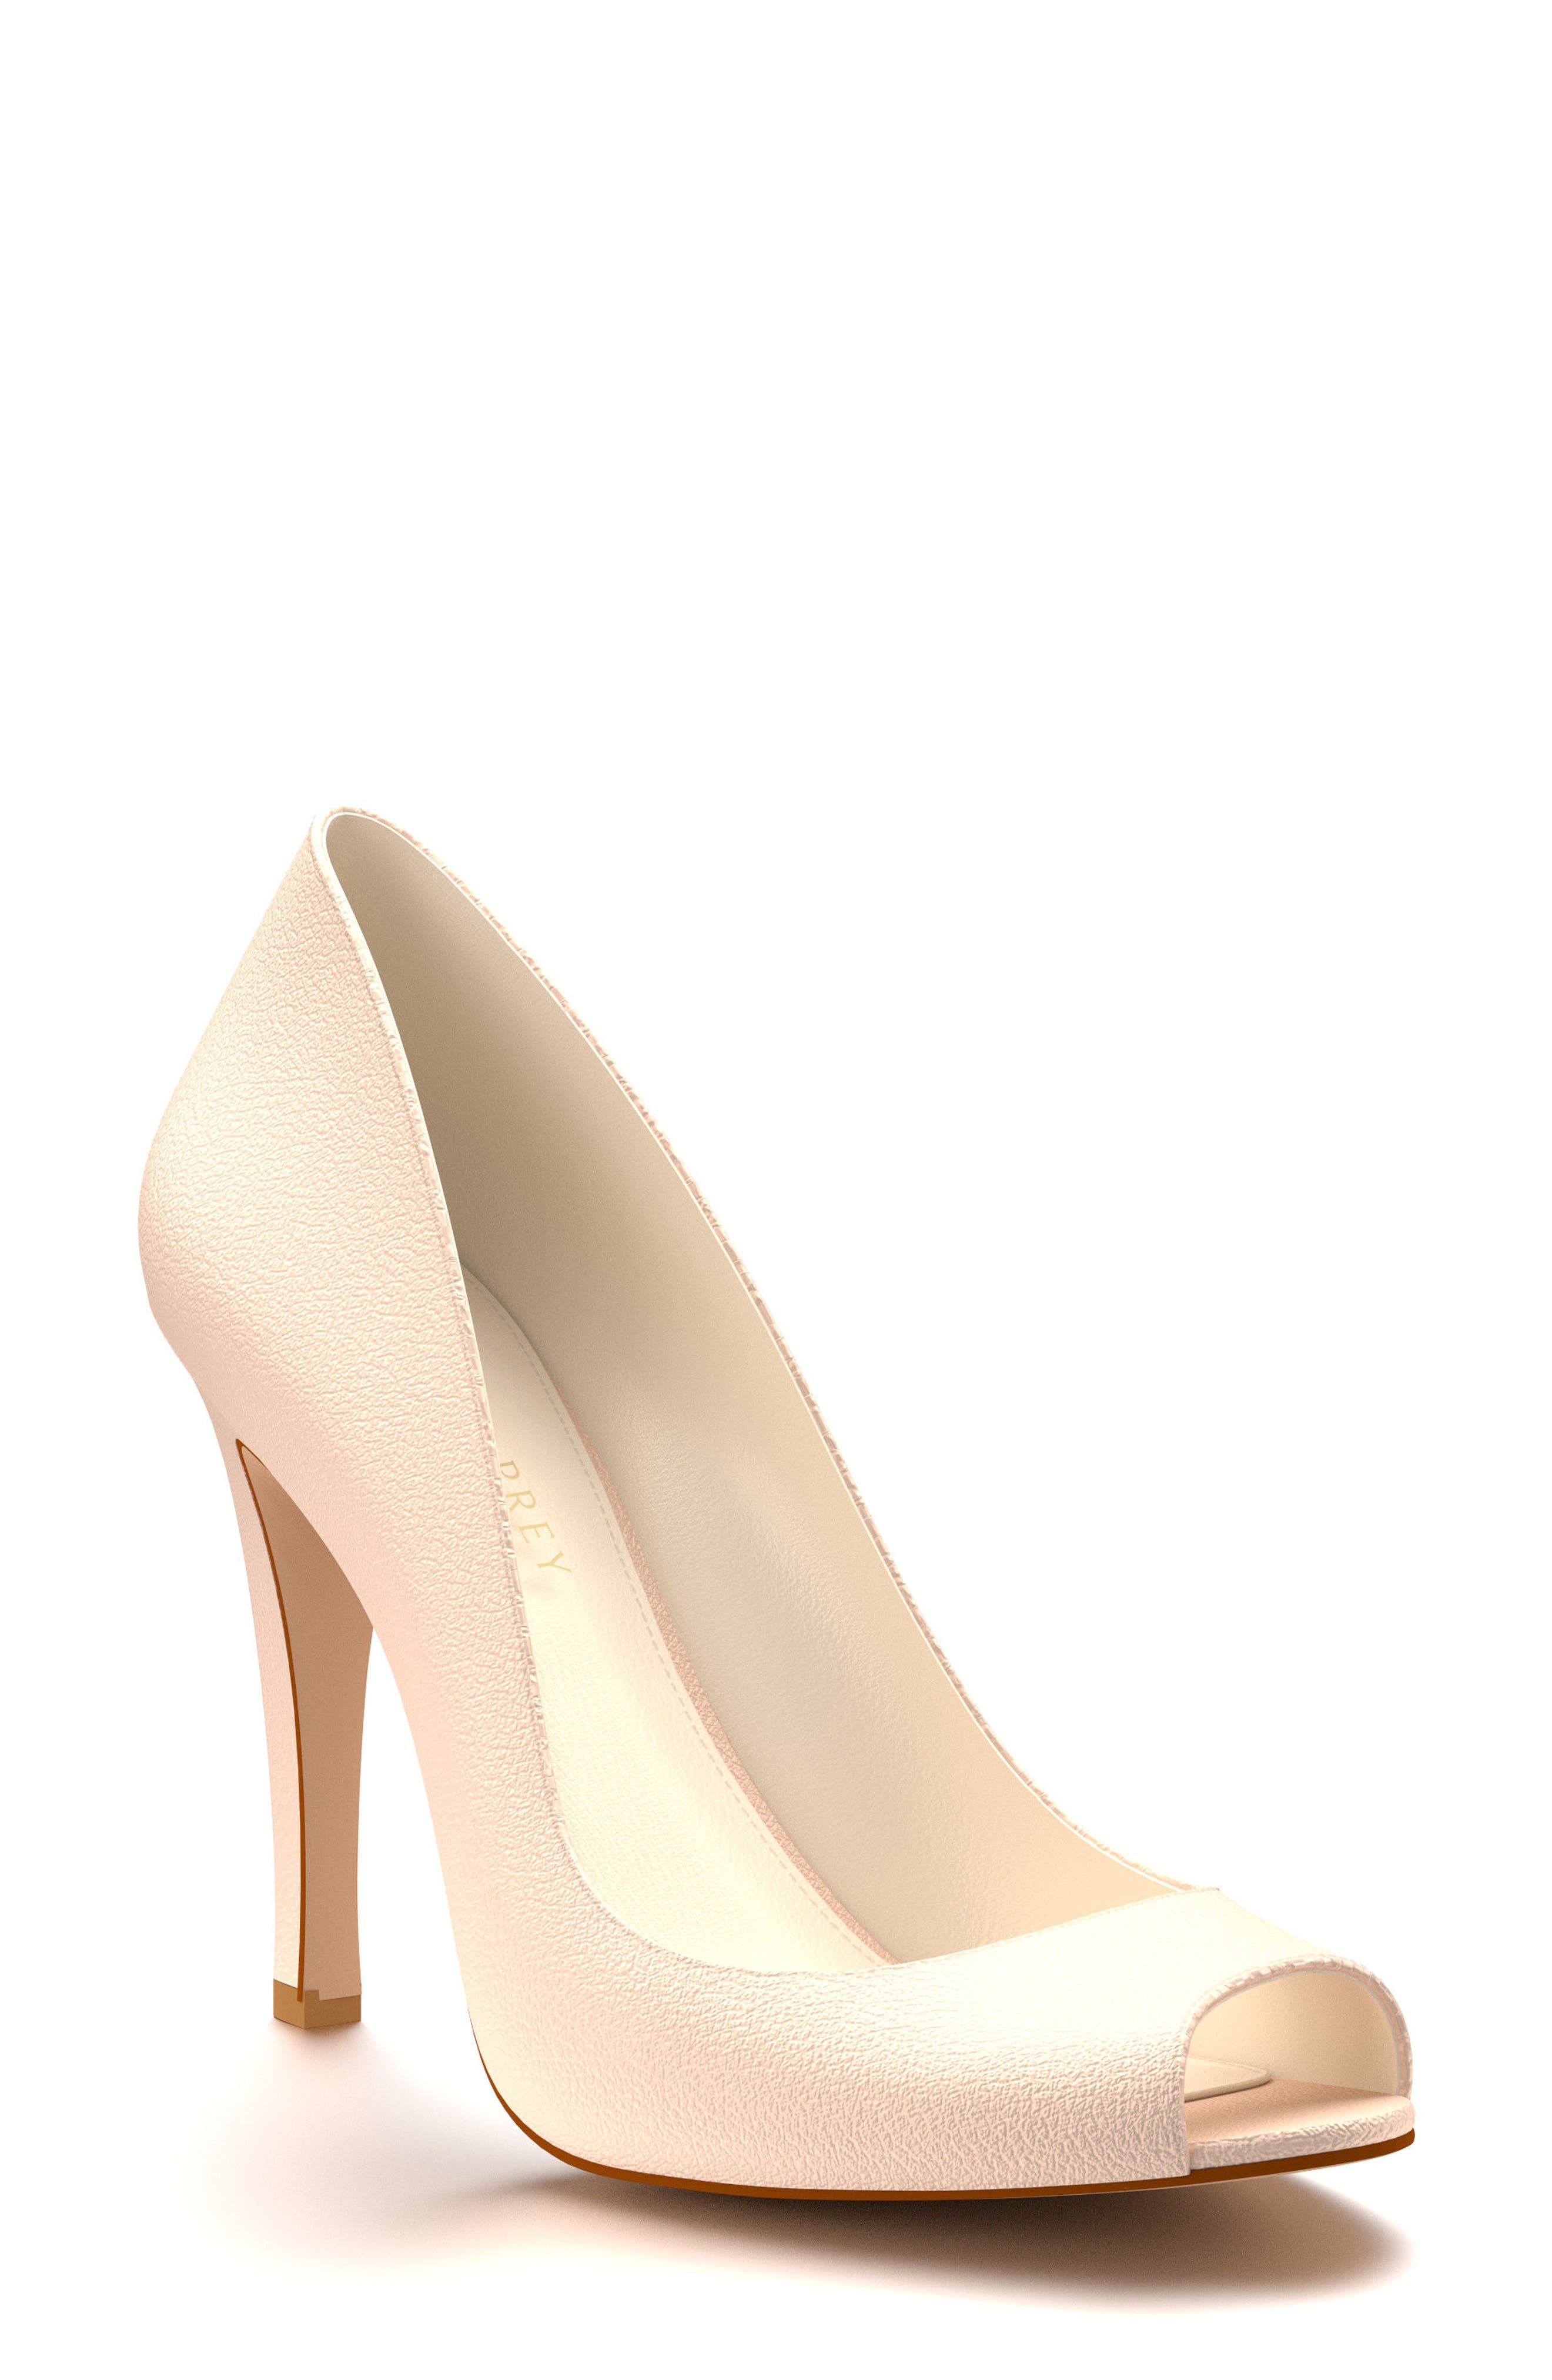 Main Image - Shoes of Prey Peep Toe Pump (Women)